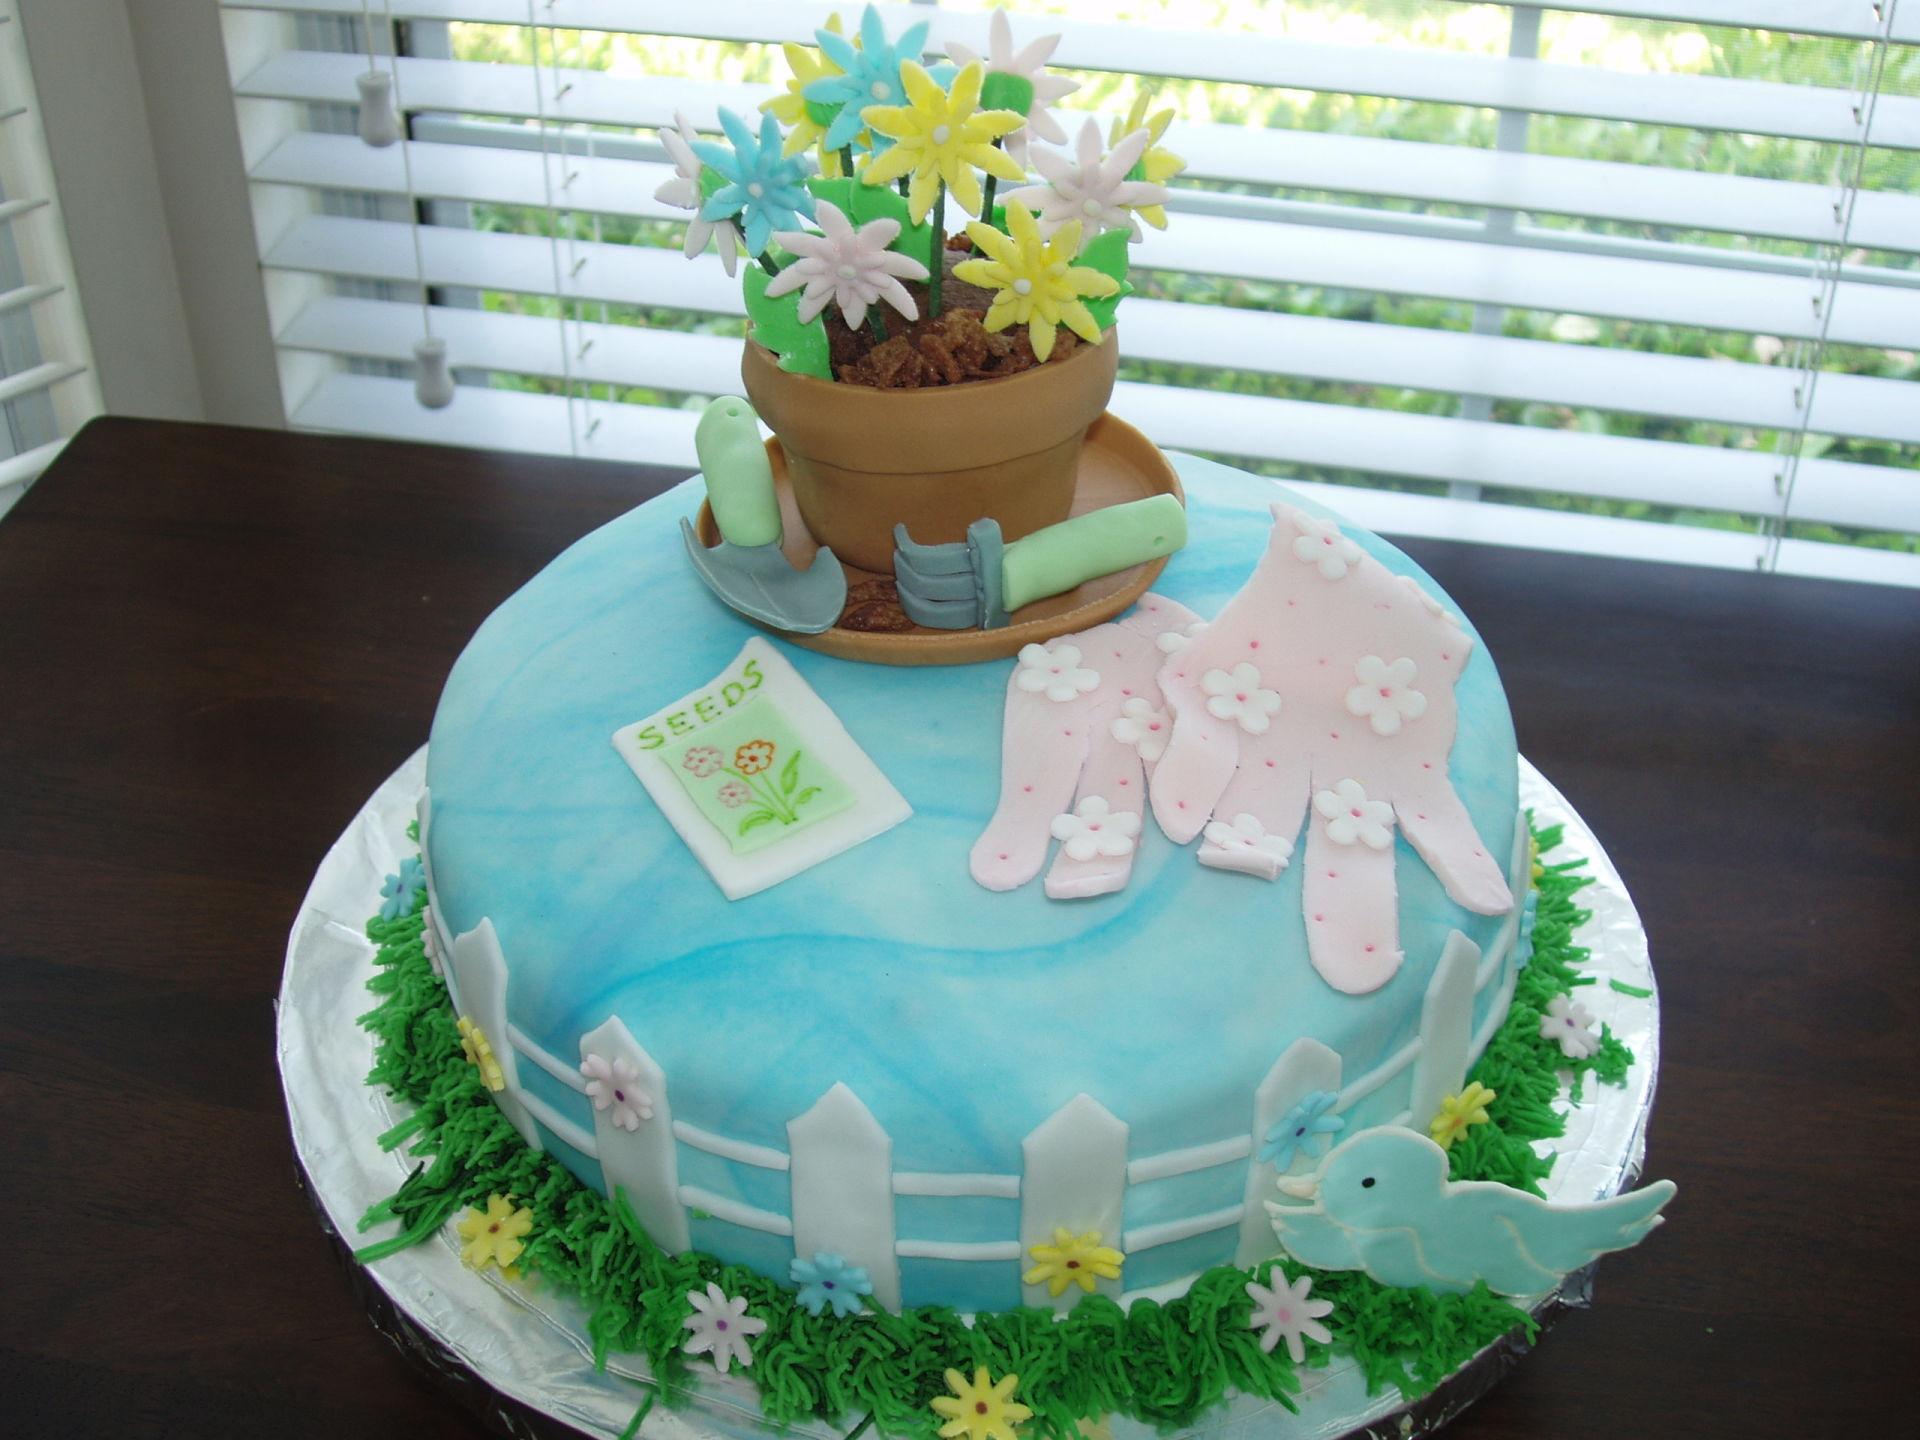 Gardening theme fondant cake